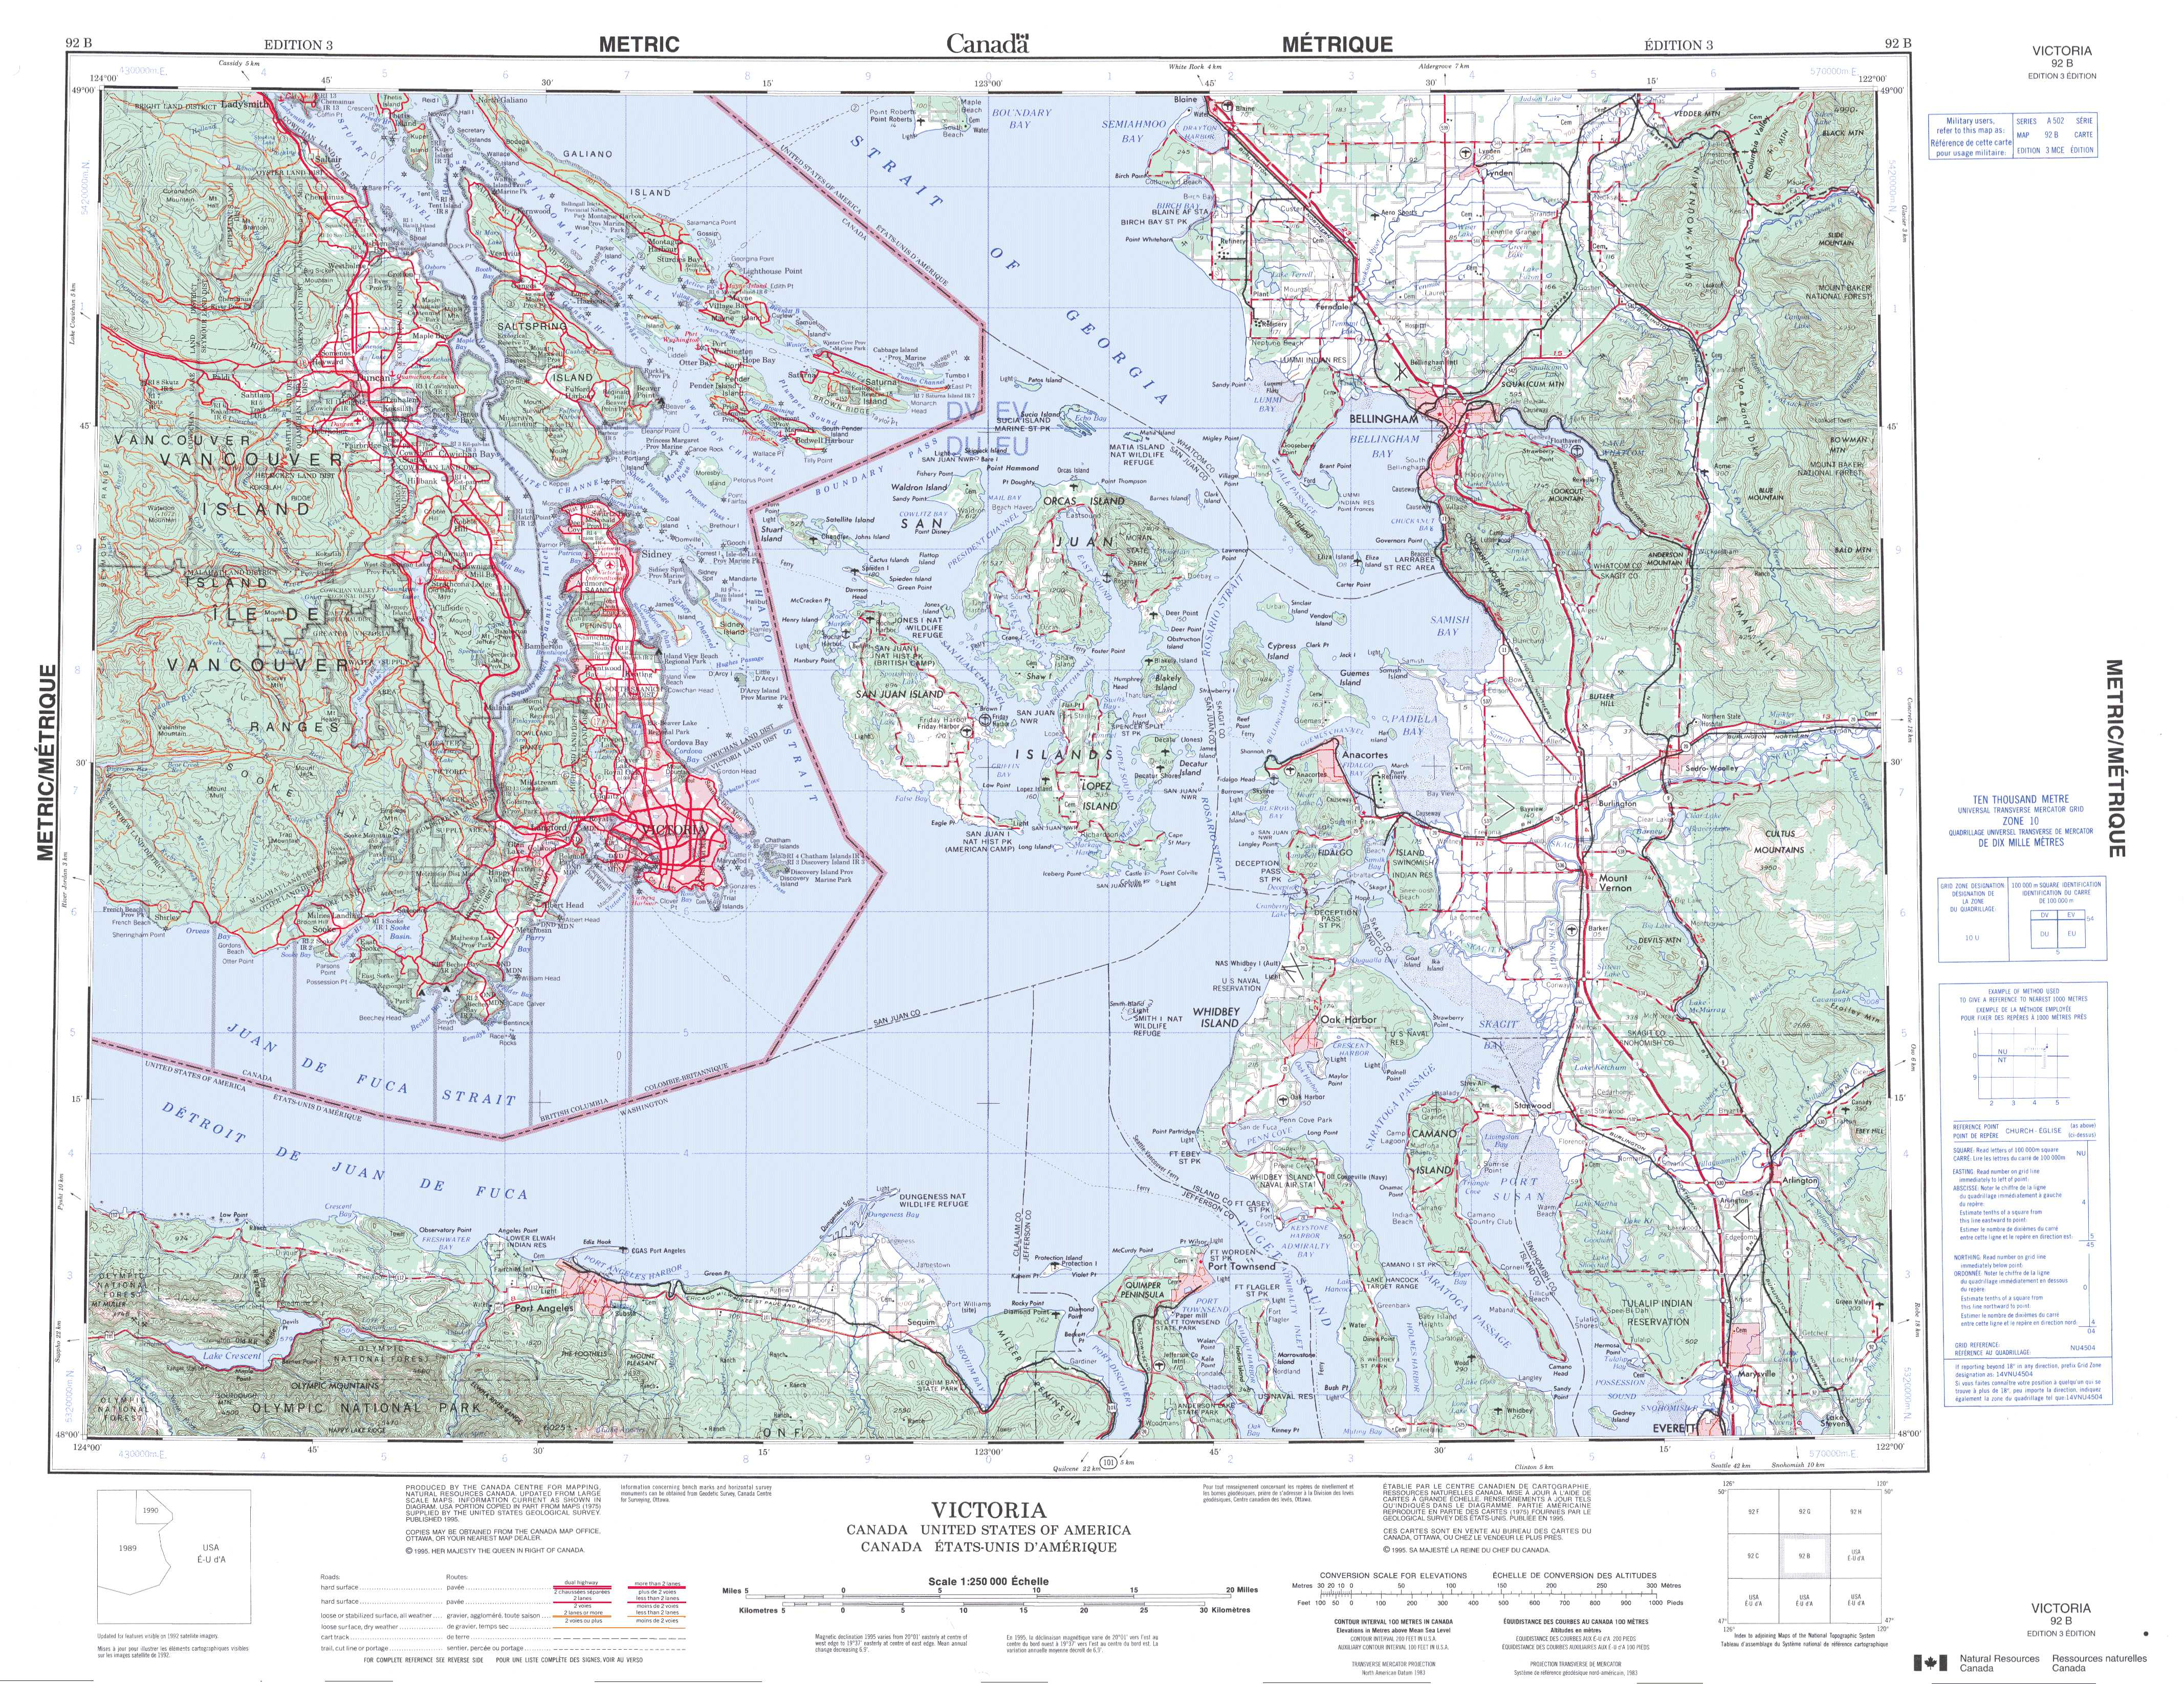 Printable Topographic Map Of Victoria 092B, Bc - Printable Topo Maps Online